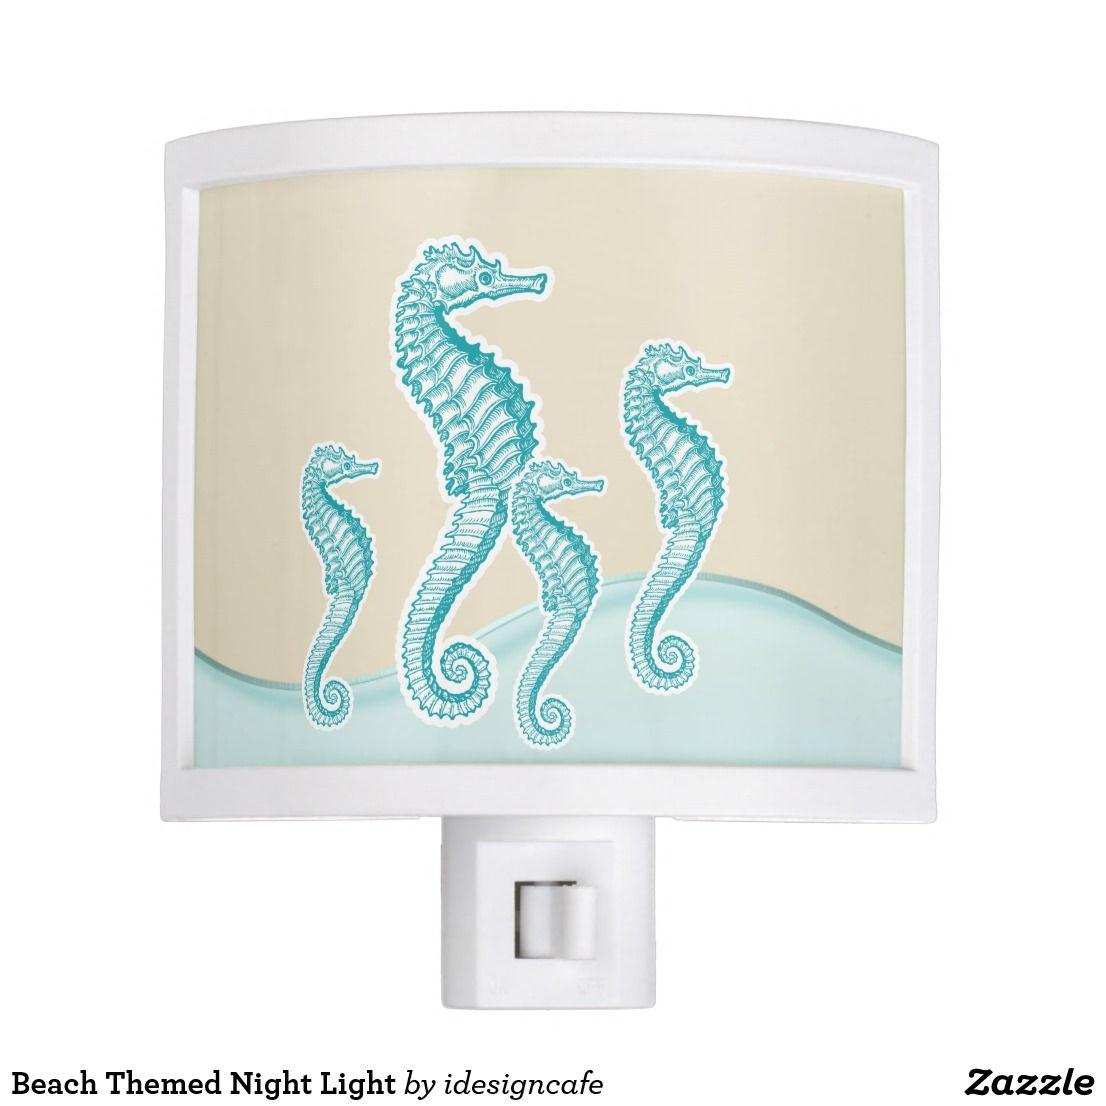 Beach Themed Night Light Zazzle Com Night Light Decorative